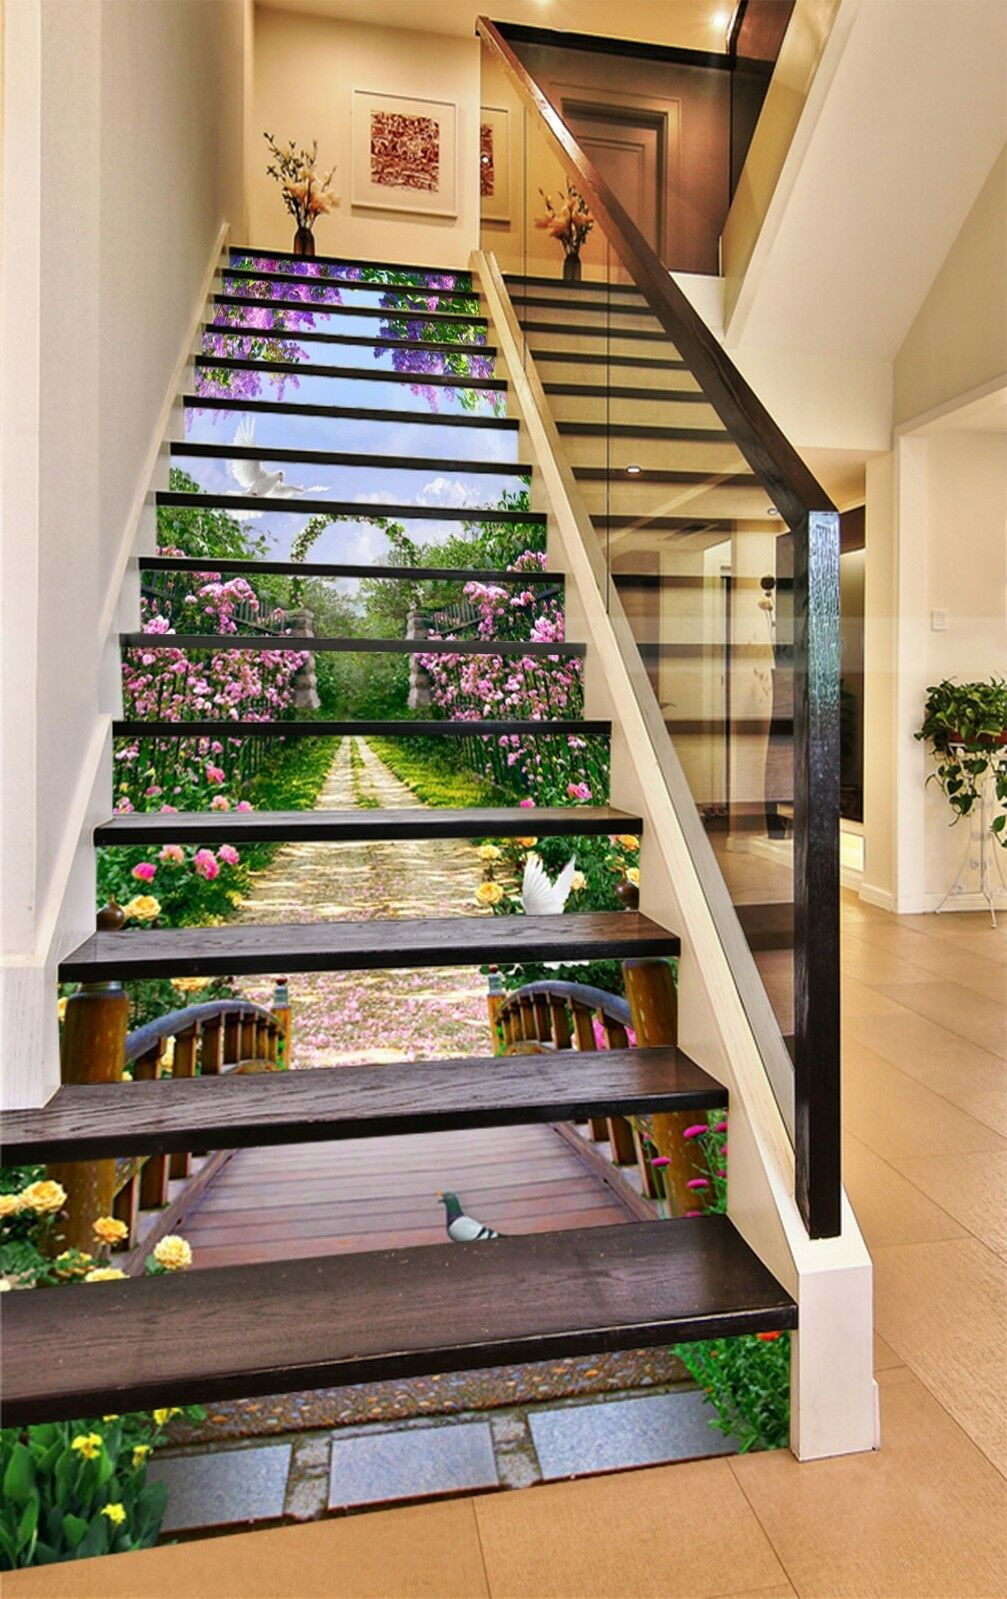 3D Garden Road Stair Risers Decoration Photo Mural Vinyl Decal Wallpaper AU